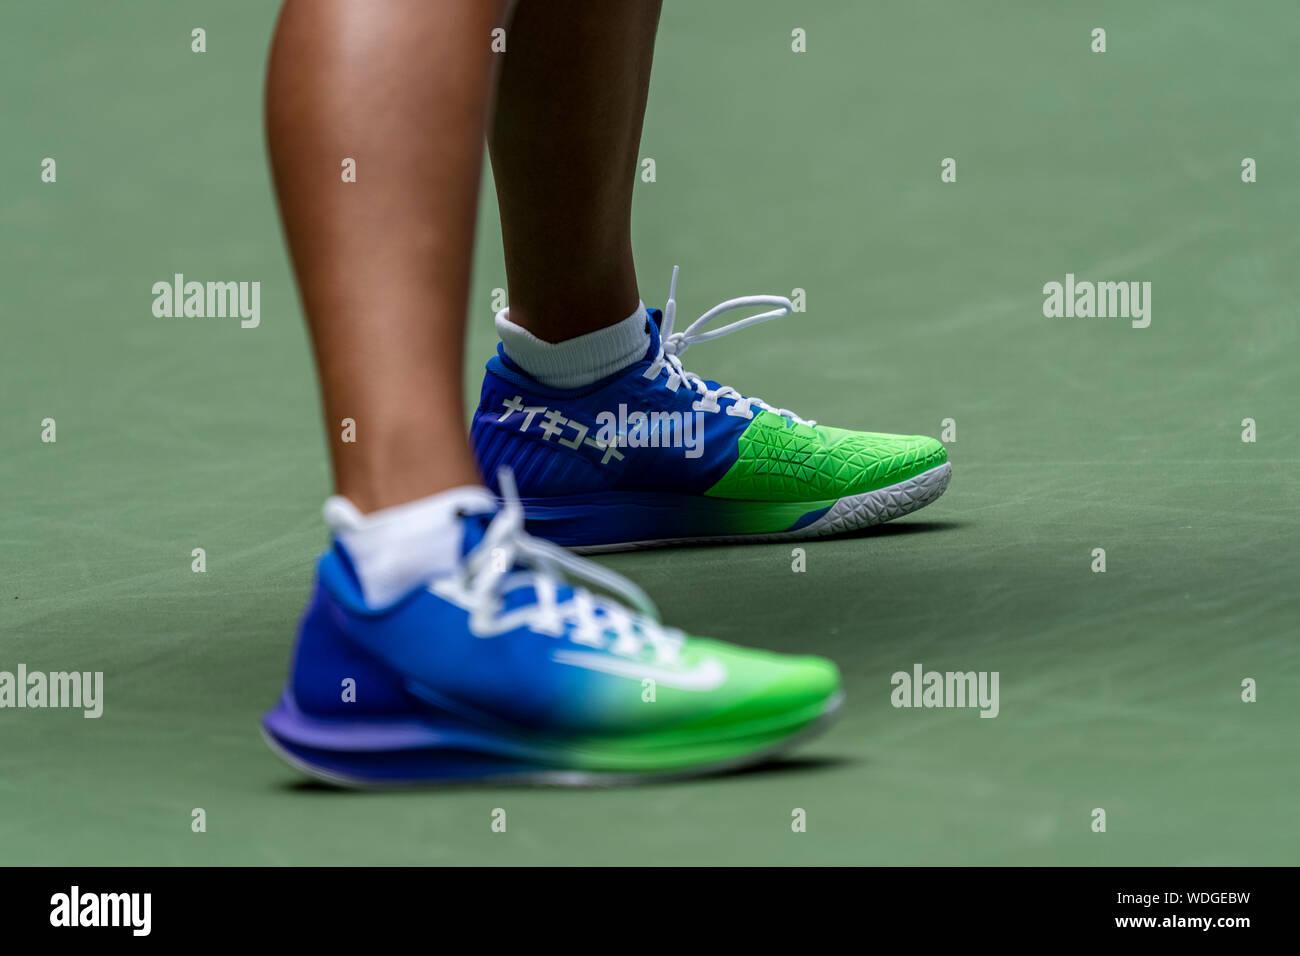 Nike Nike StockfotosNaomi Naomi Bilder Osaka Alamy Osaka jAL534R